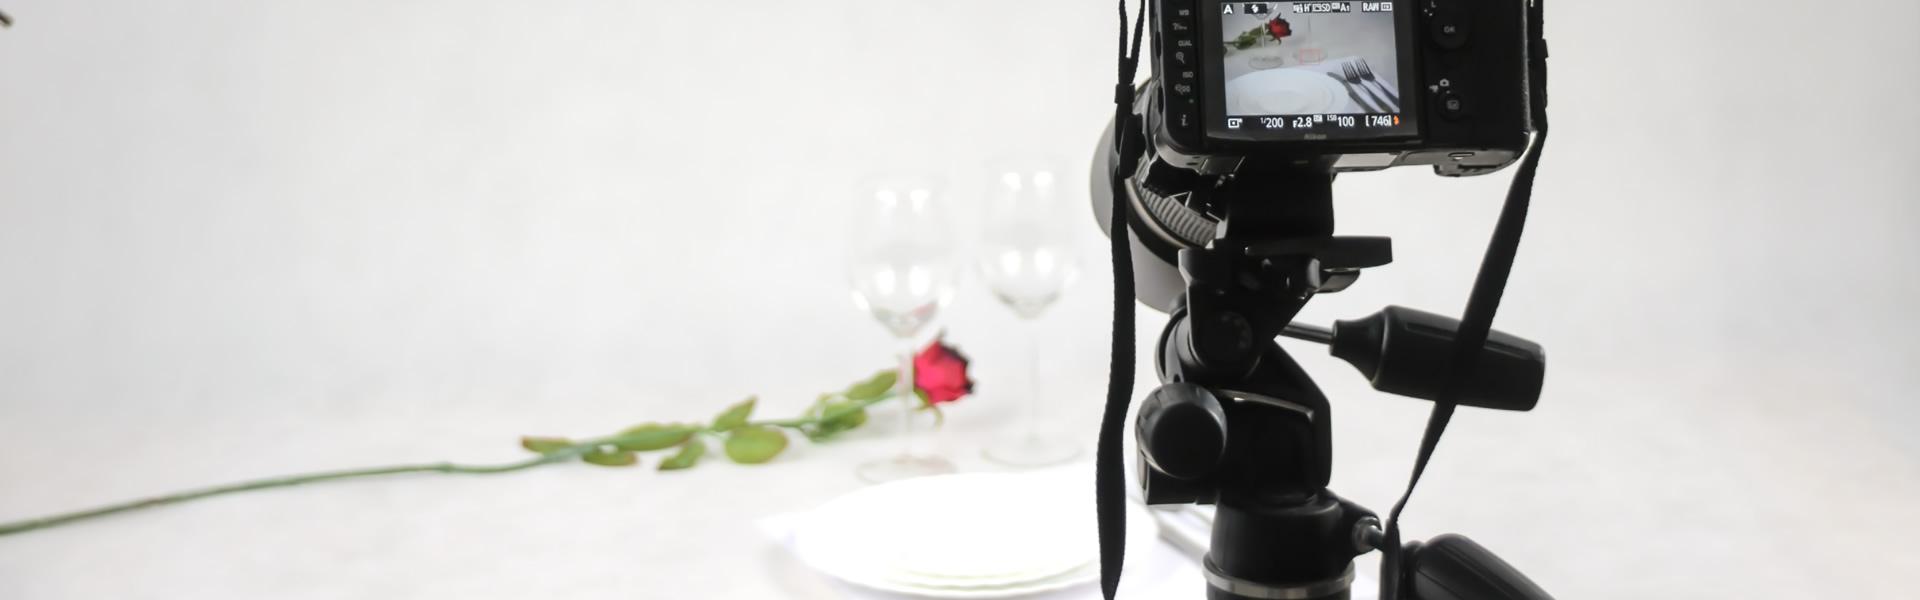 nbstudio web design it photos realit virtuelle. Black Bedroom Furniture Sets. Home Design Ideas